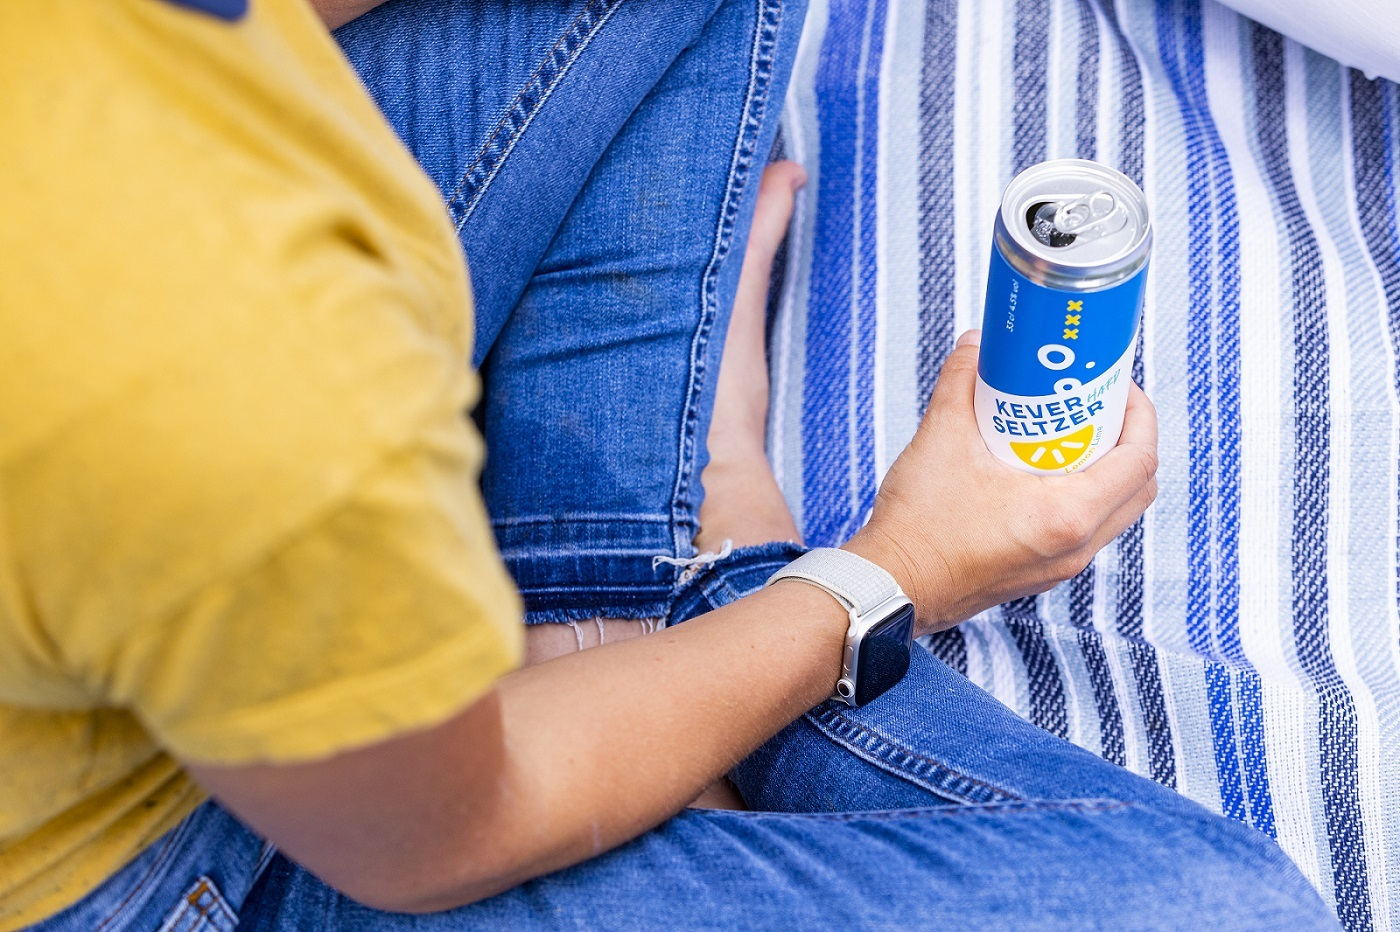 Kever genever hard seltzer gezond bier alternatief